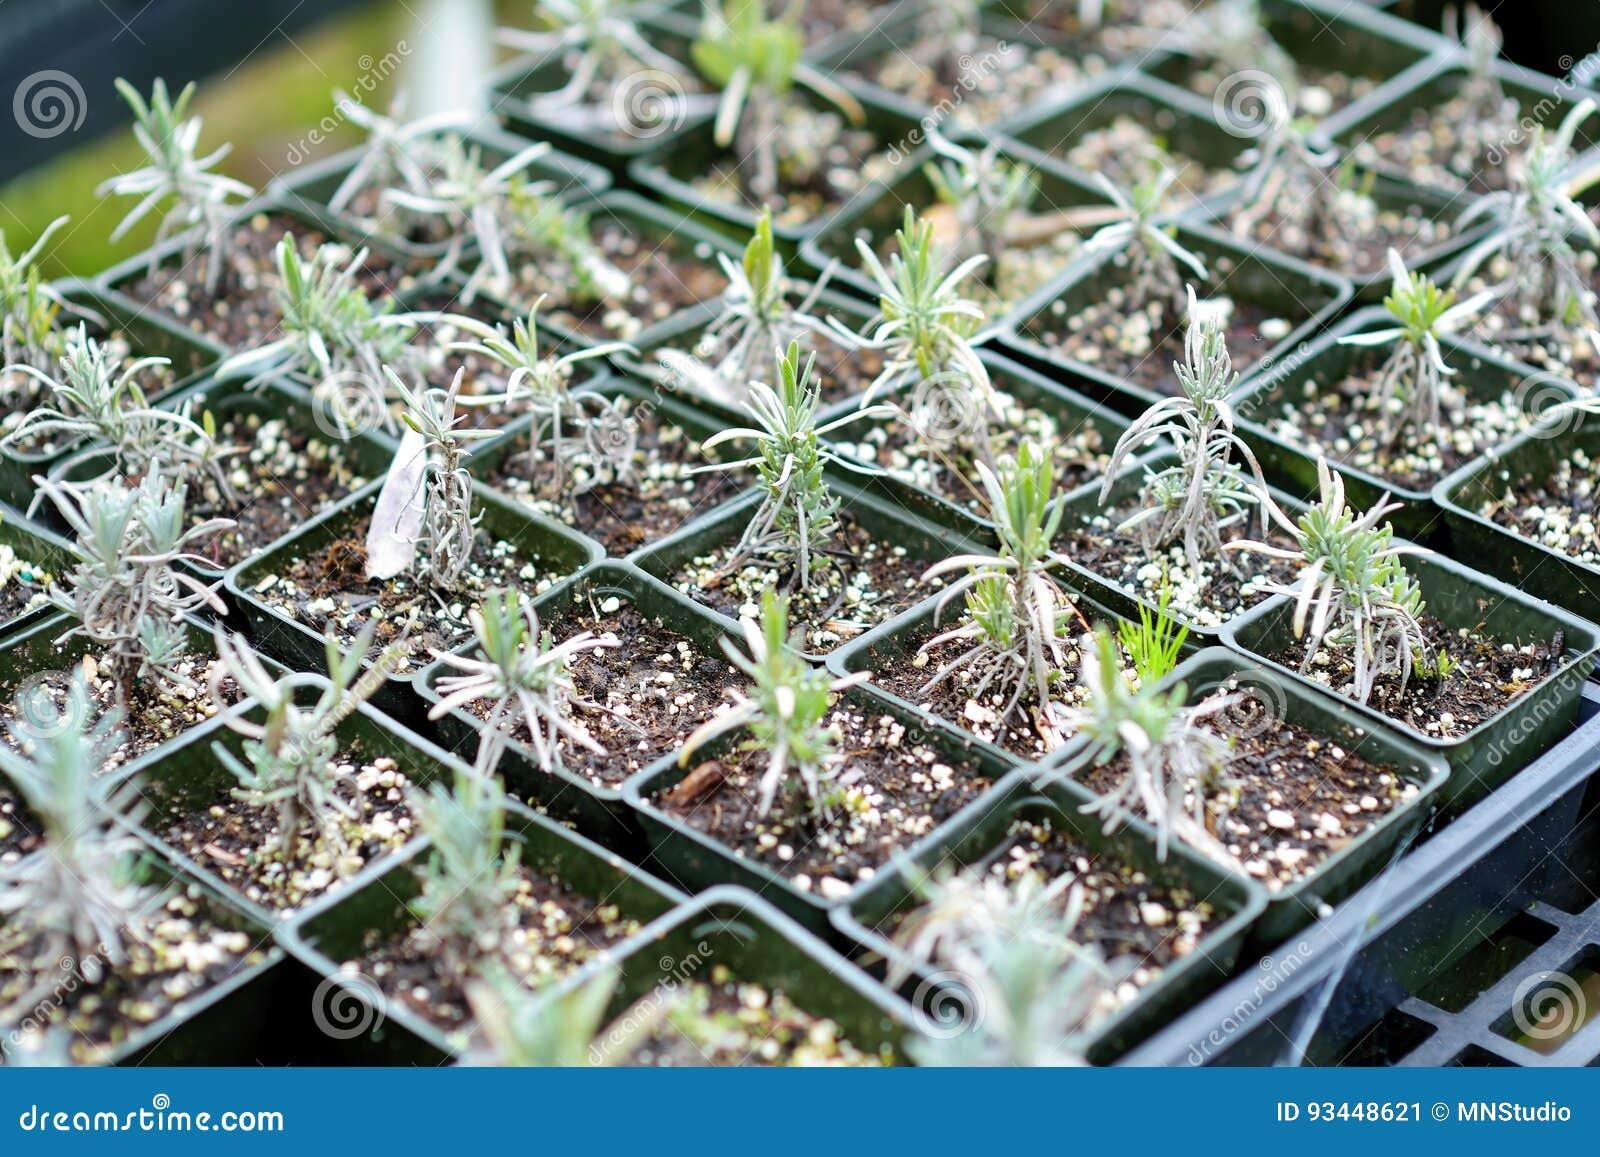 Lavender Seedlings In The Greenhouse Located In Kula